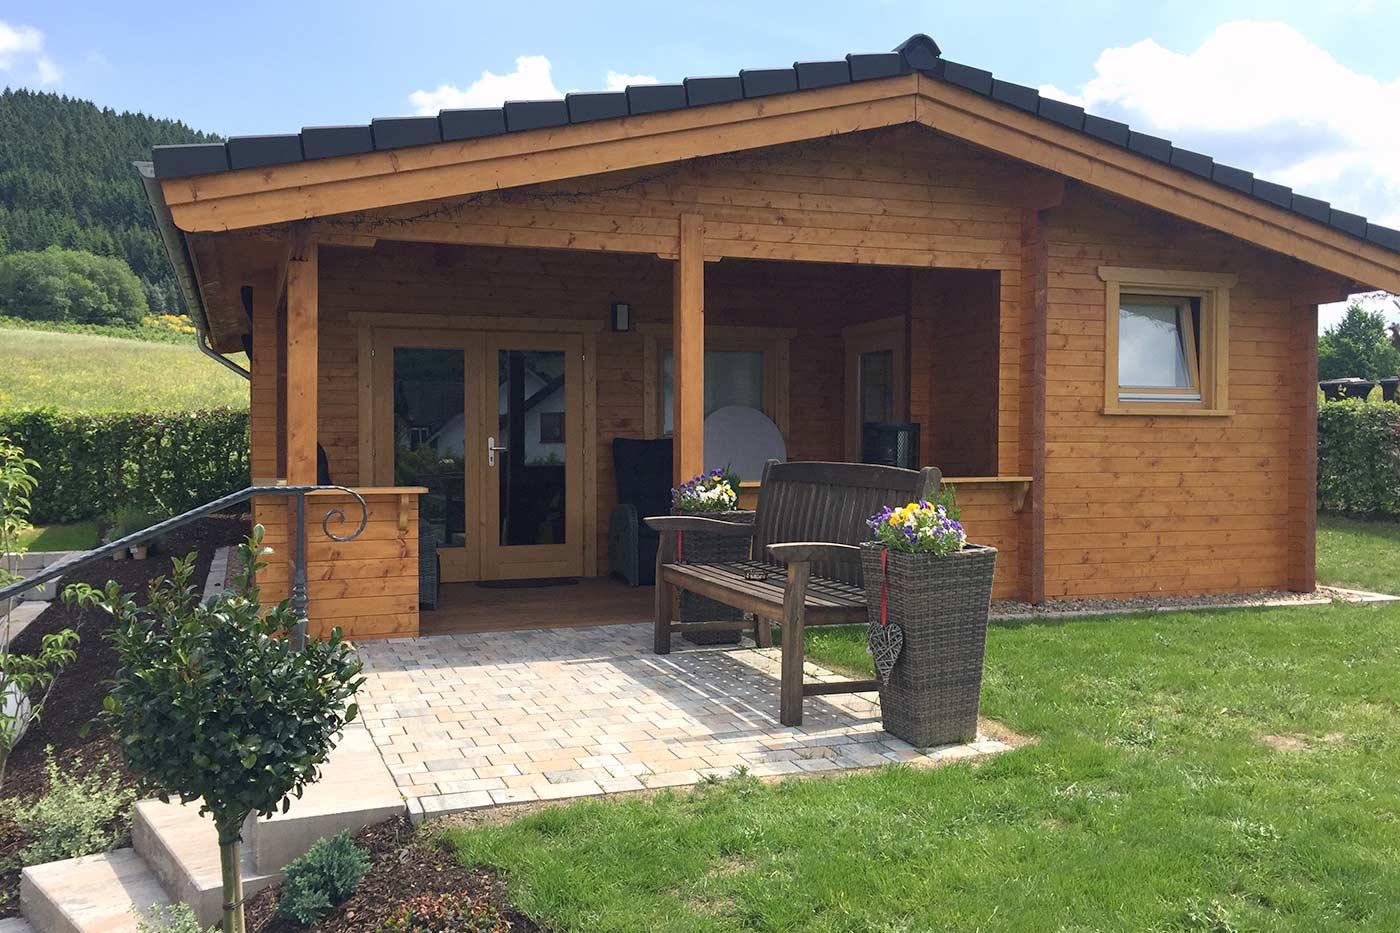 gartenhaus 4545 v 90 4 50 x 4 50 m vordach 2 00 m kranenberg. Black Bedroom Furniture Sets. Home Design Ideas